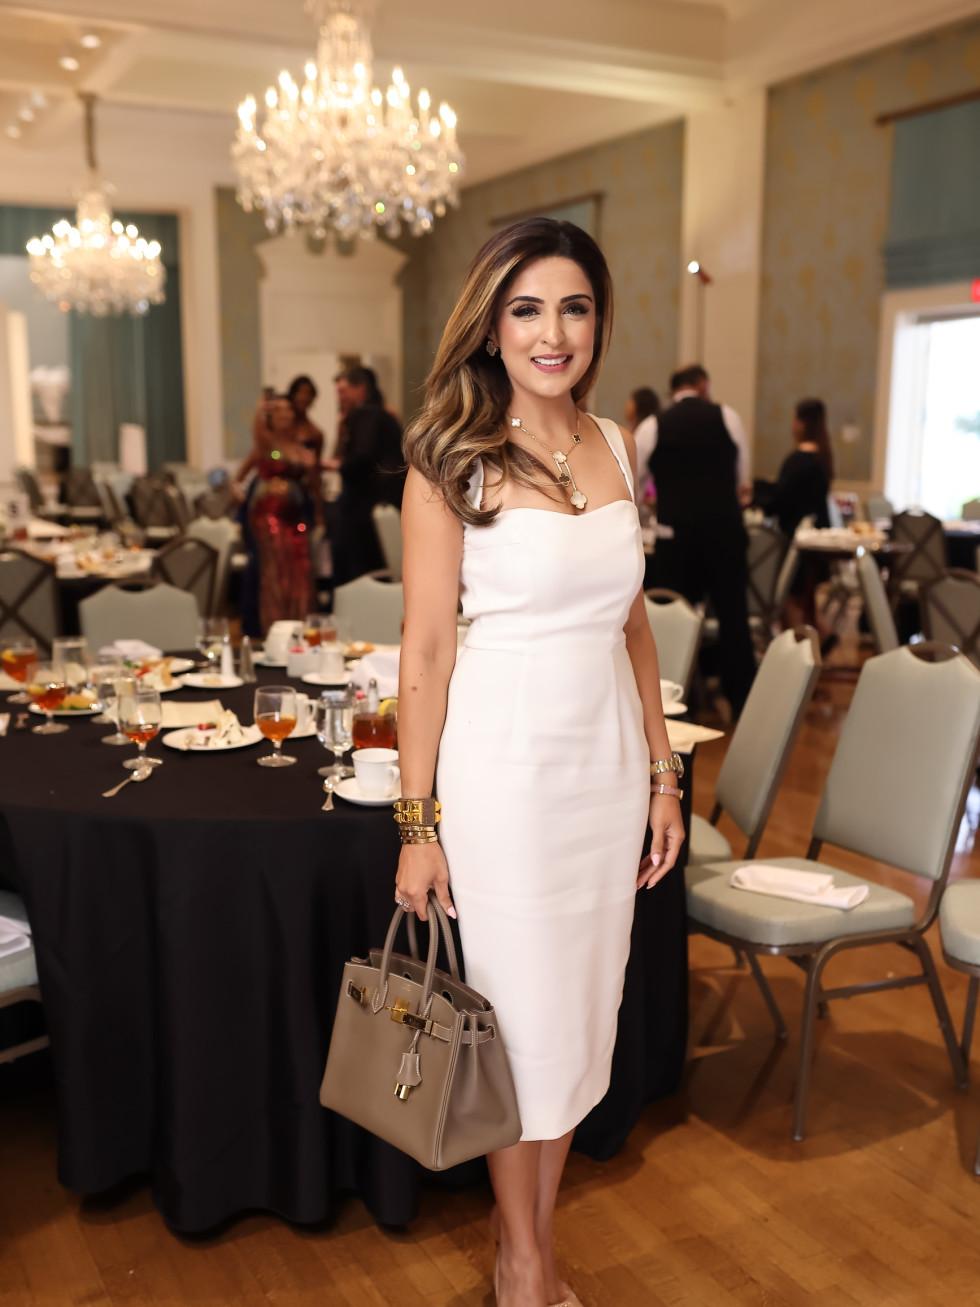 LCA Houston Mother's Day 2021 Sneha Merchant